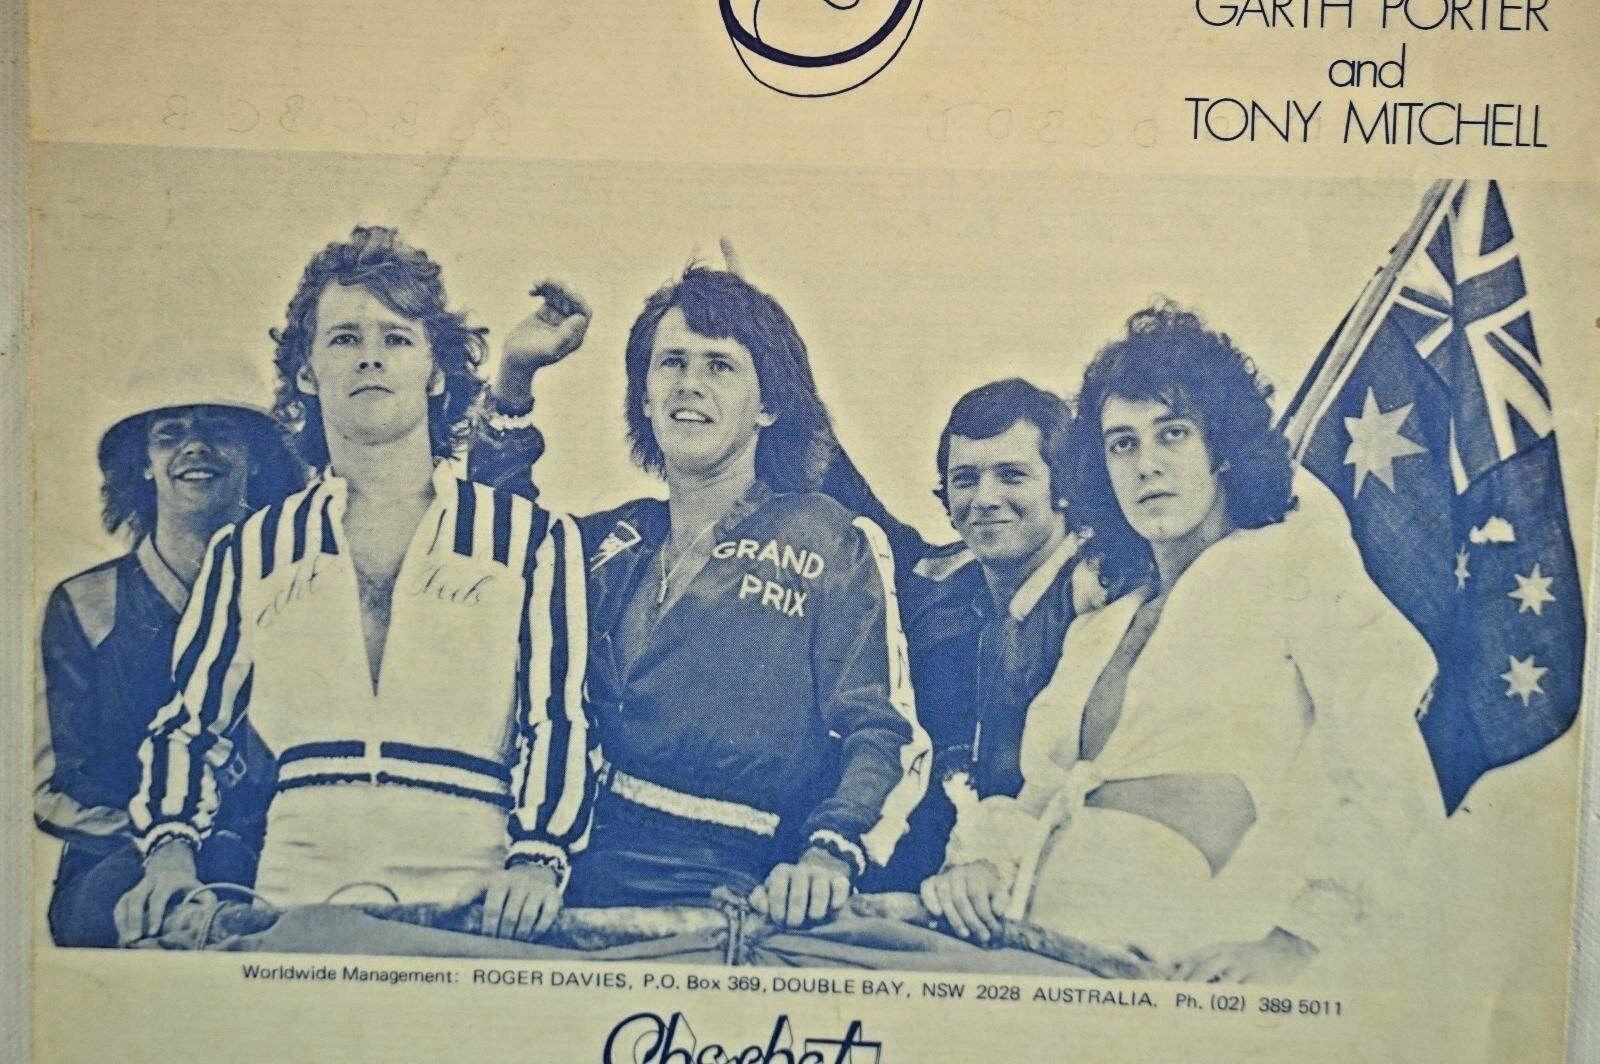 Howzat Sherbet Garth Porter Tony Mitchell Razzle Music 1976 Vintage Sheet Music